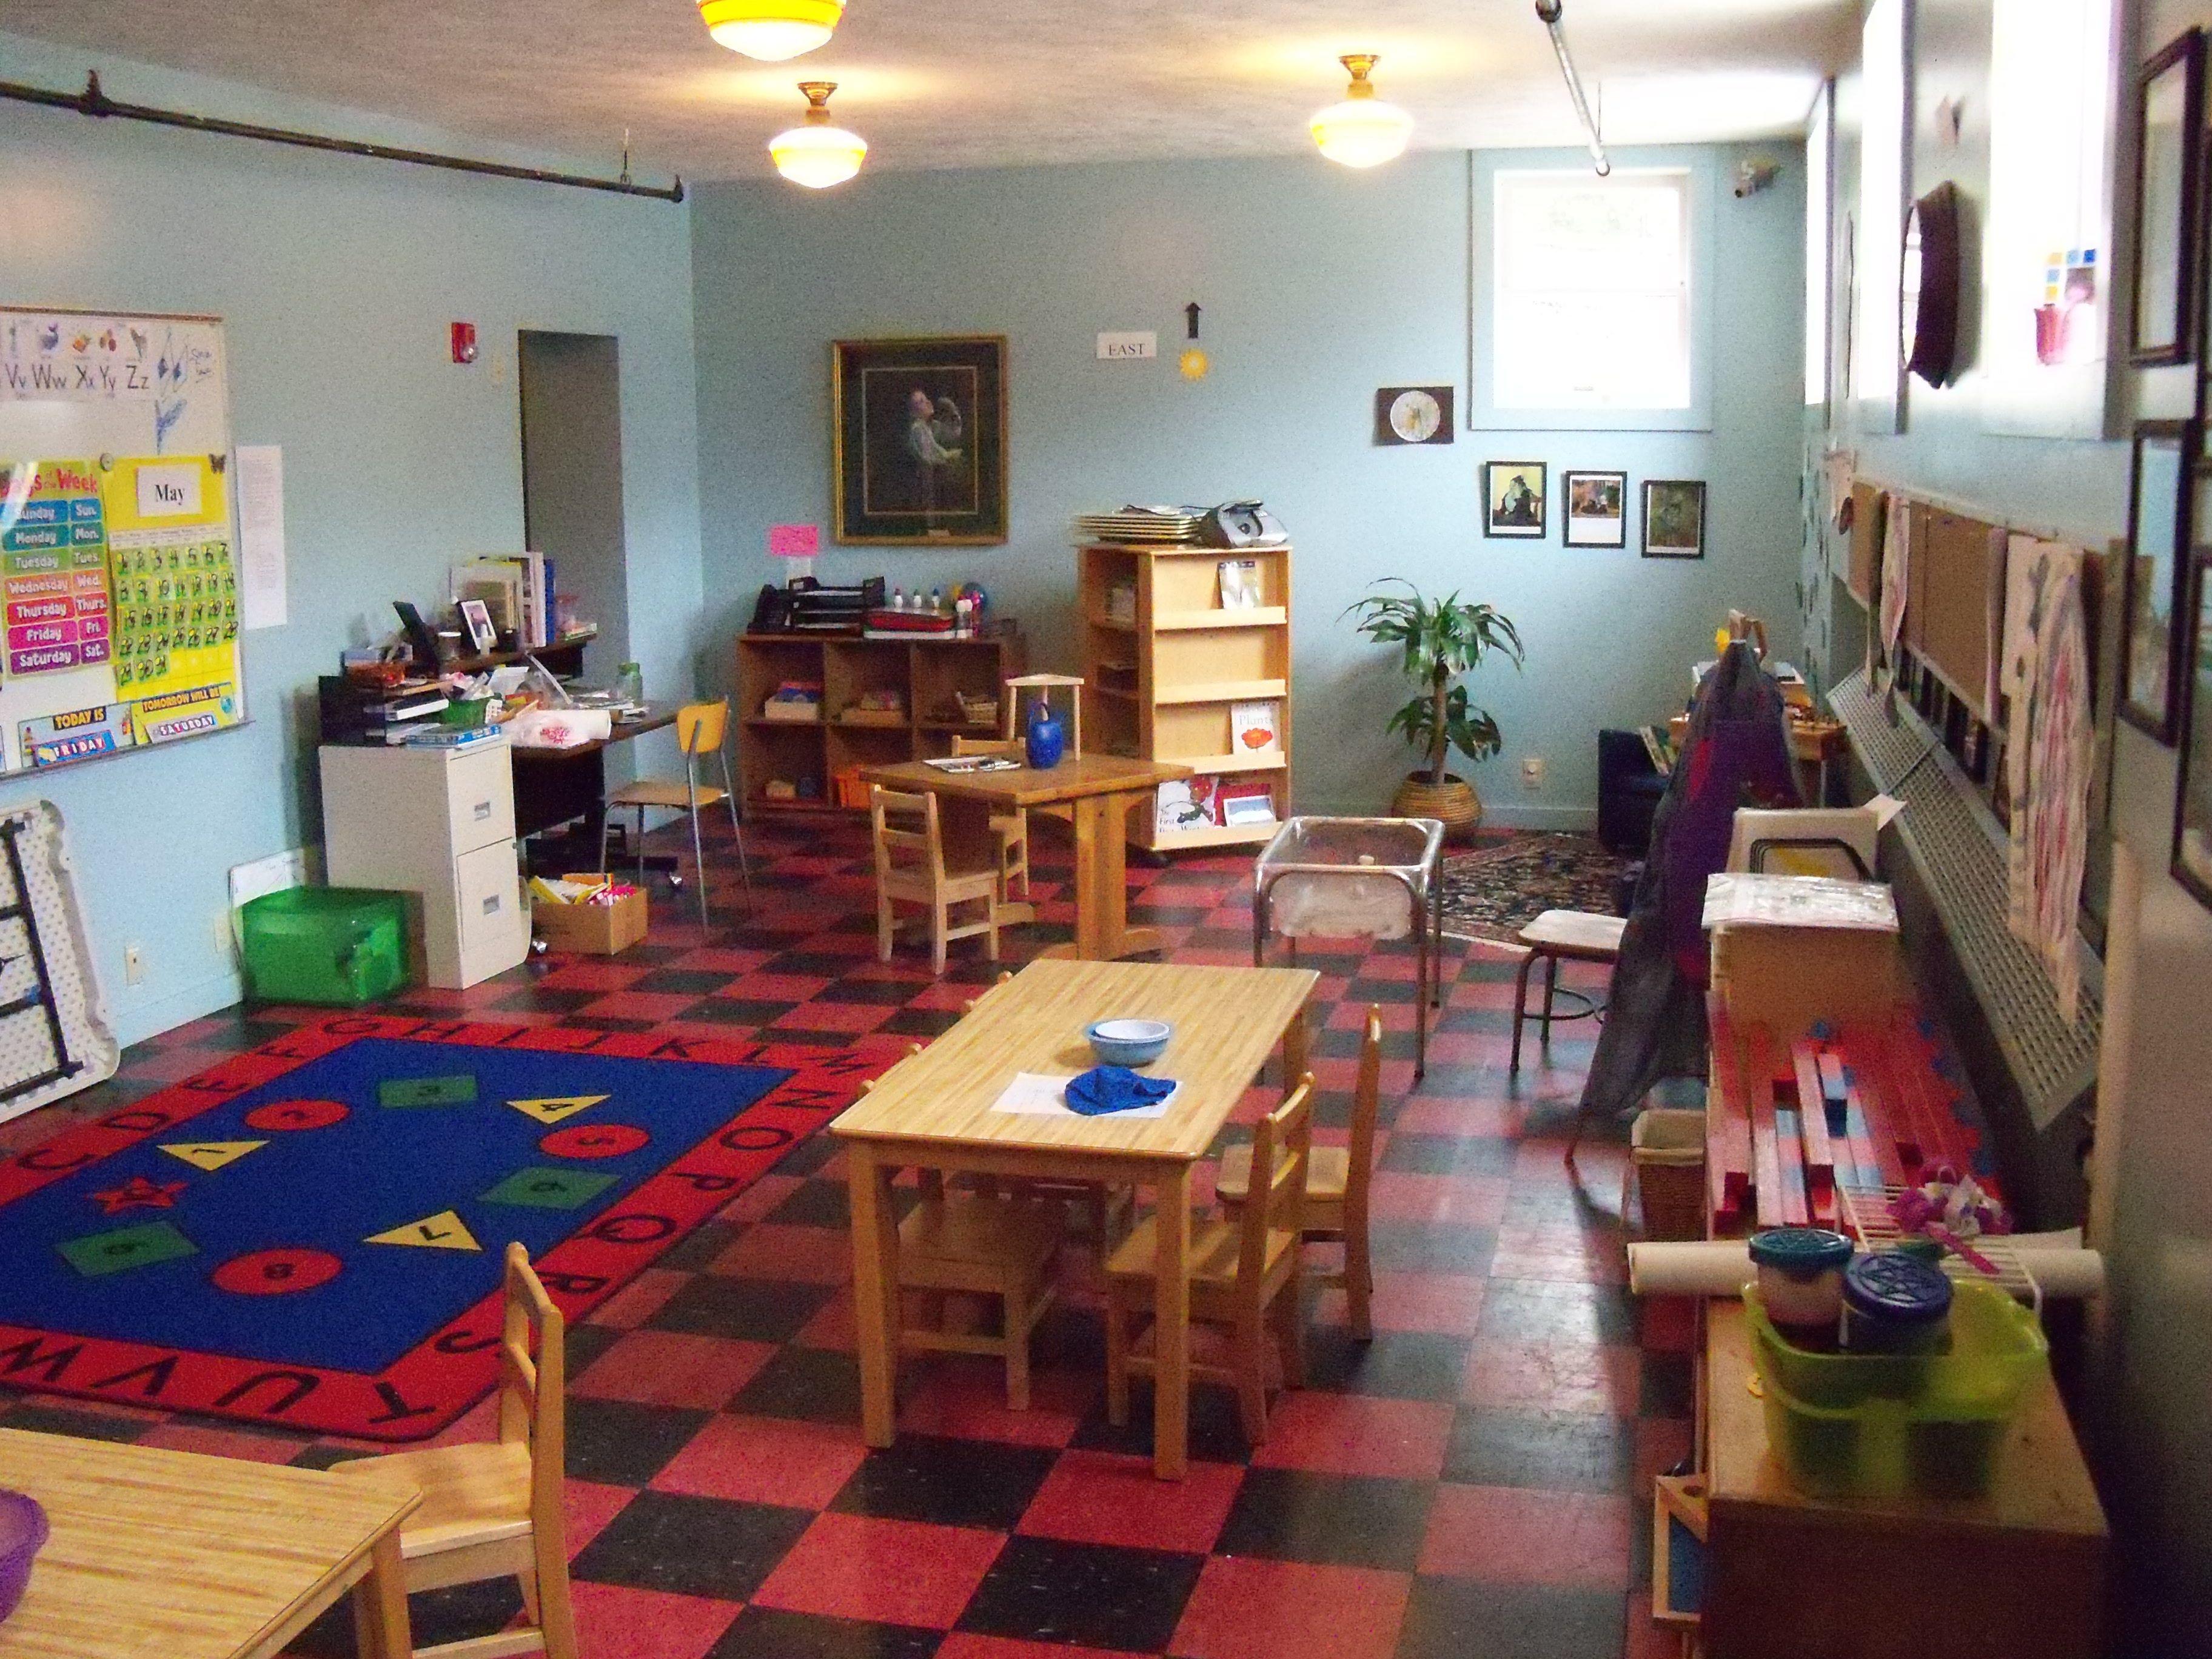 Classroom For Child Care Preschool Classroom Designs For Home Or Center Based Preschools